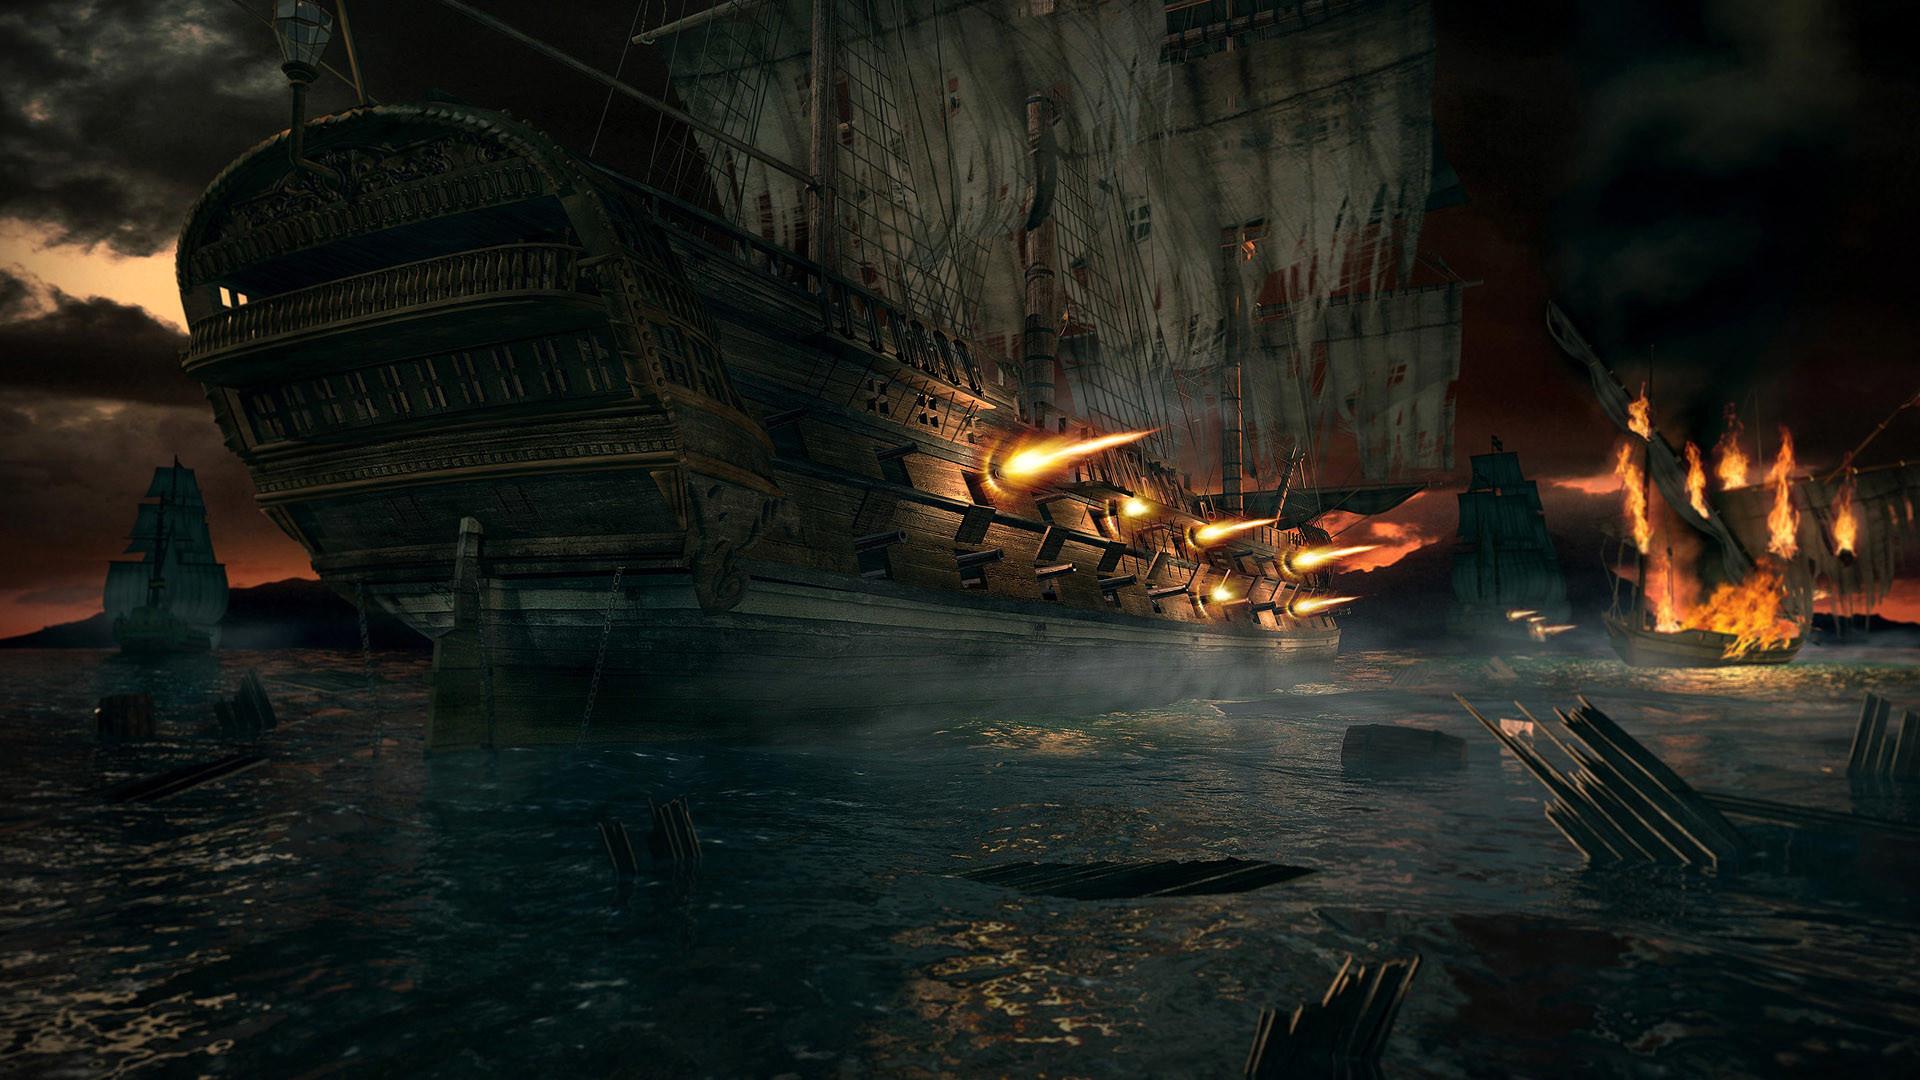 pirate-wallpaper-9